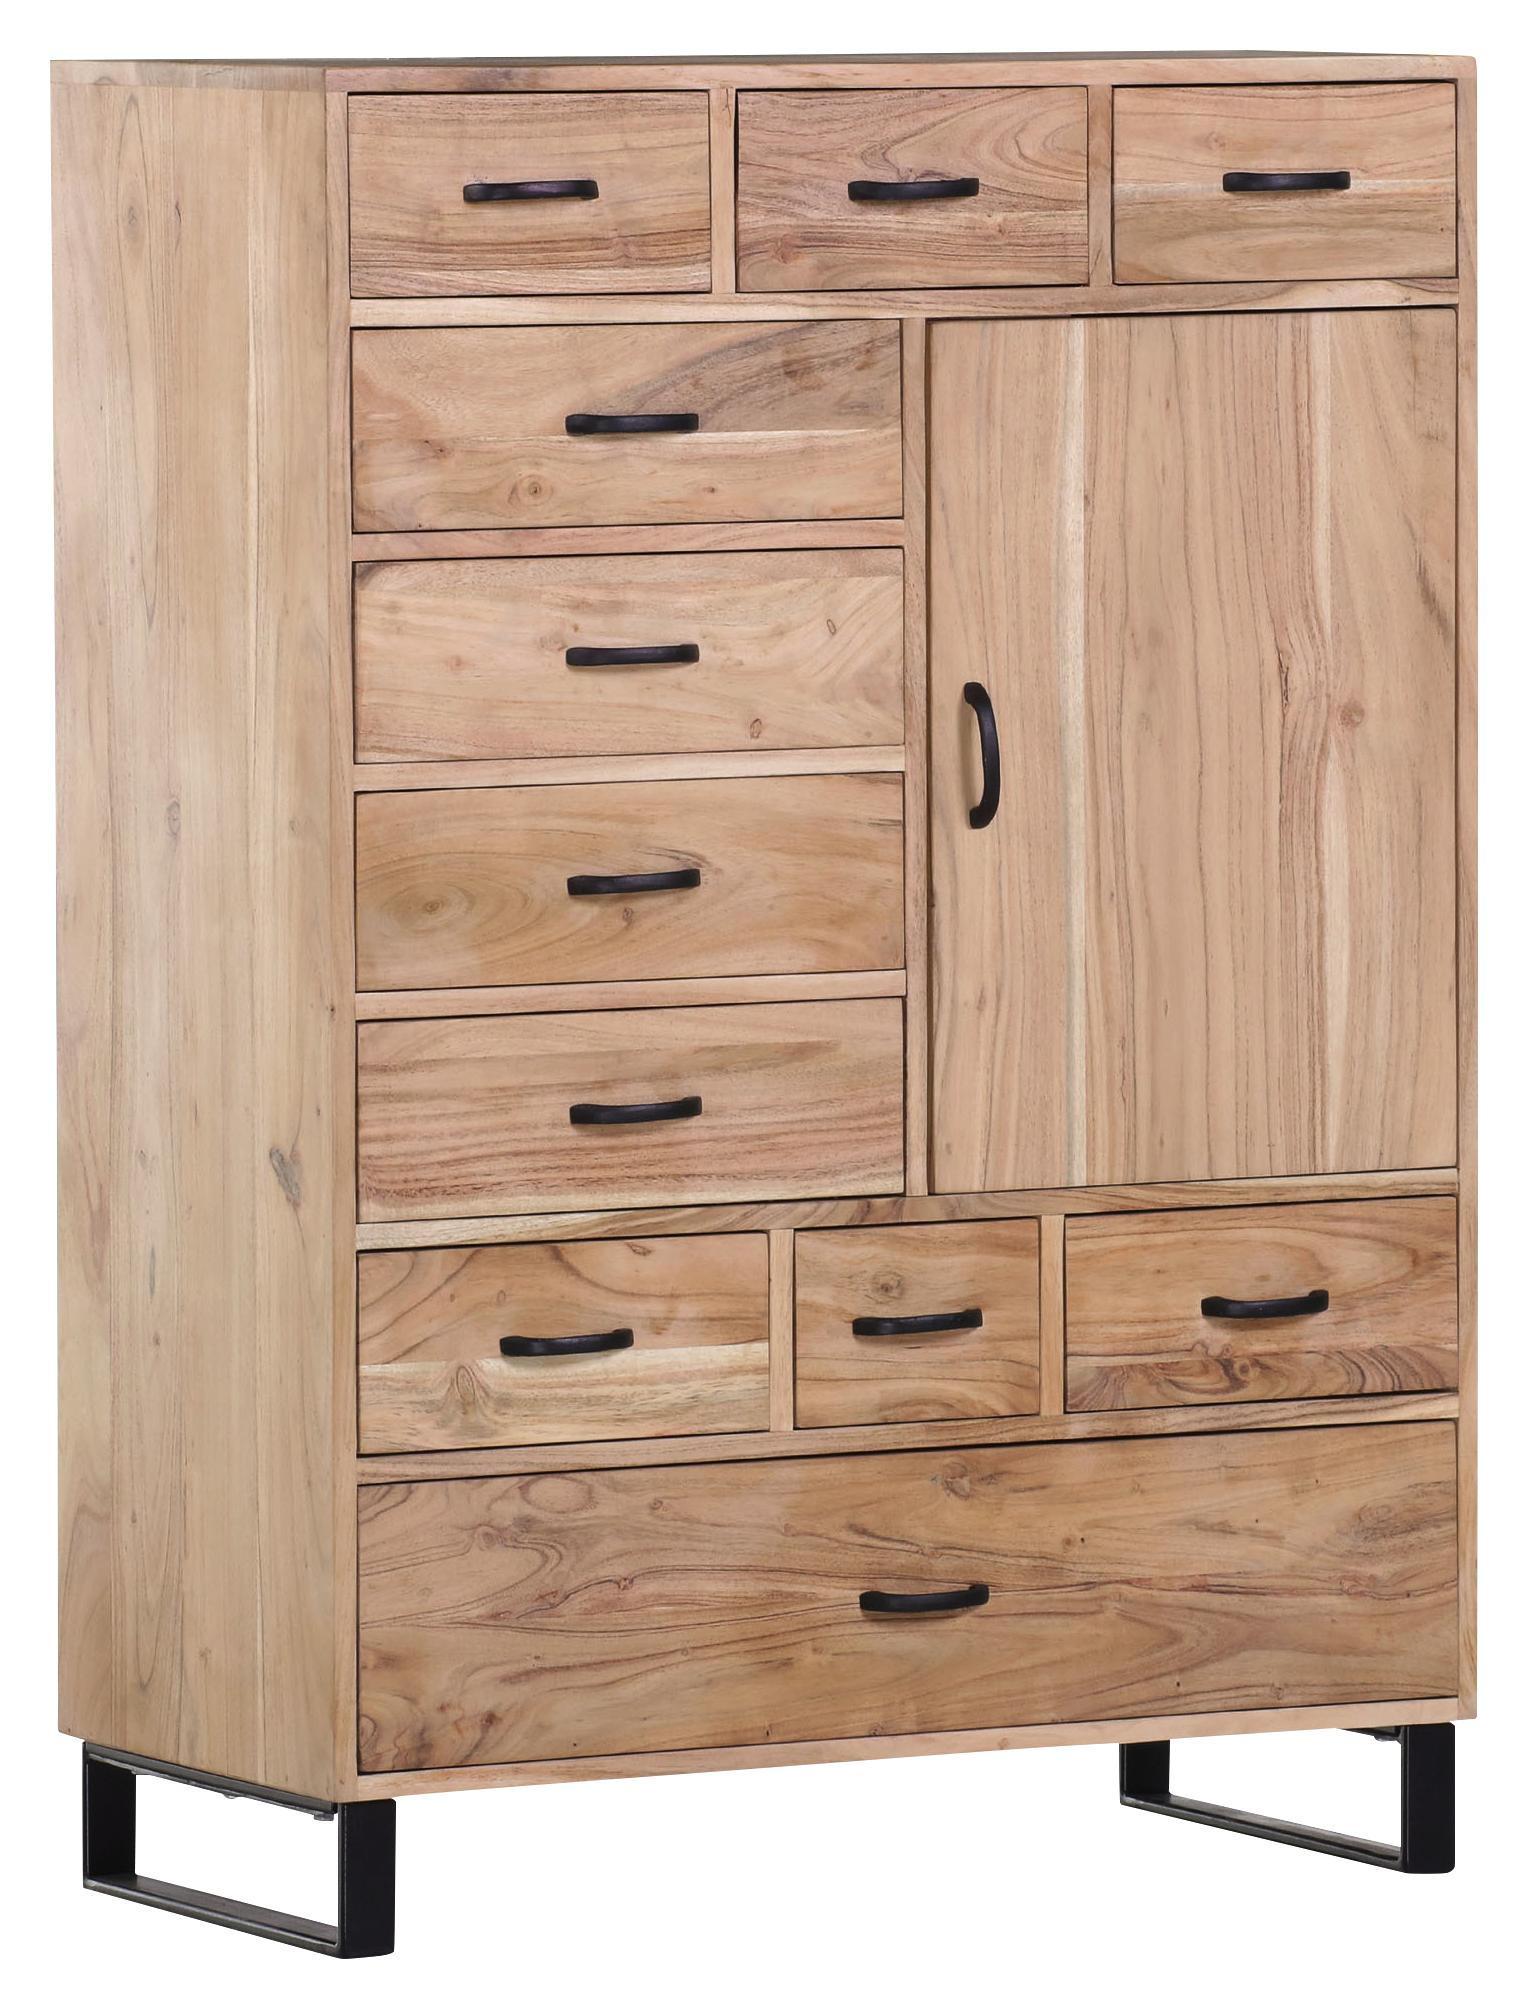 Holz Kommode Lutz Porta Sofa Angebot Frisch Kommode Kaufen Elegant